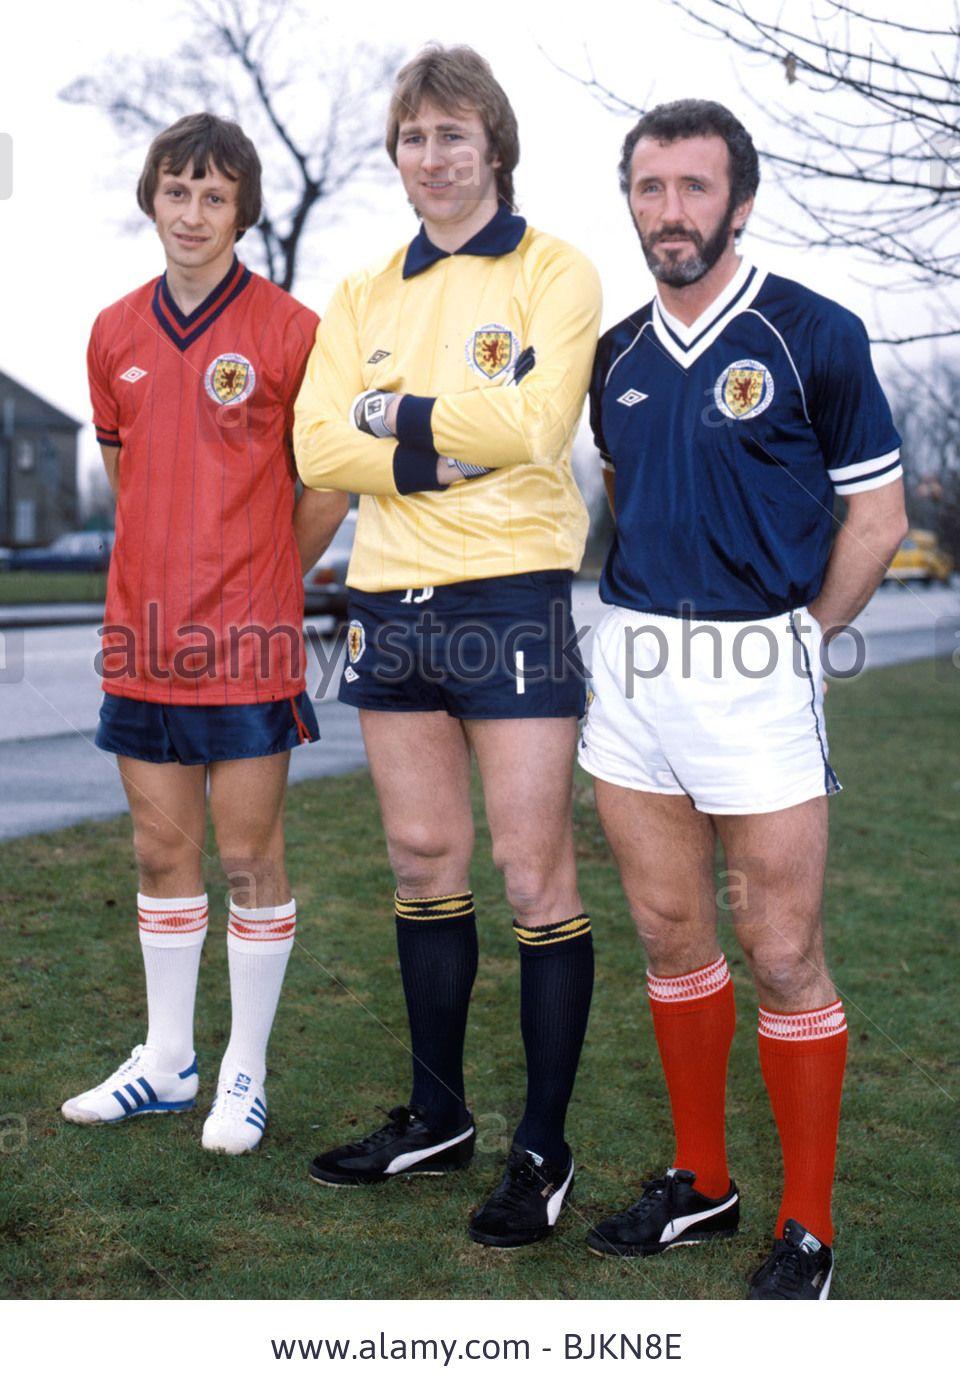 Season 1981/1982 Scotland (l-r) Paul Sturrock, Alan Rough, Danny Stock Photo, Royalty Free Image: 28707966 - Alamy